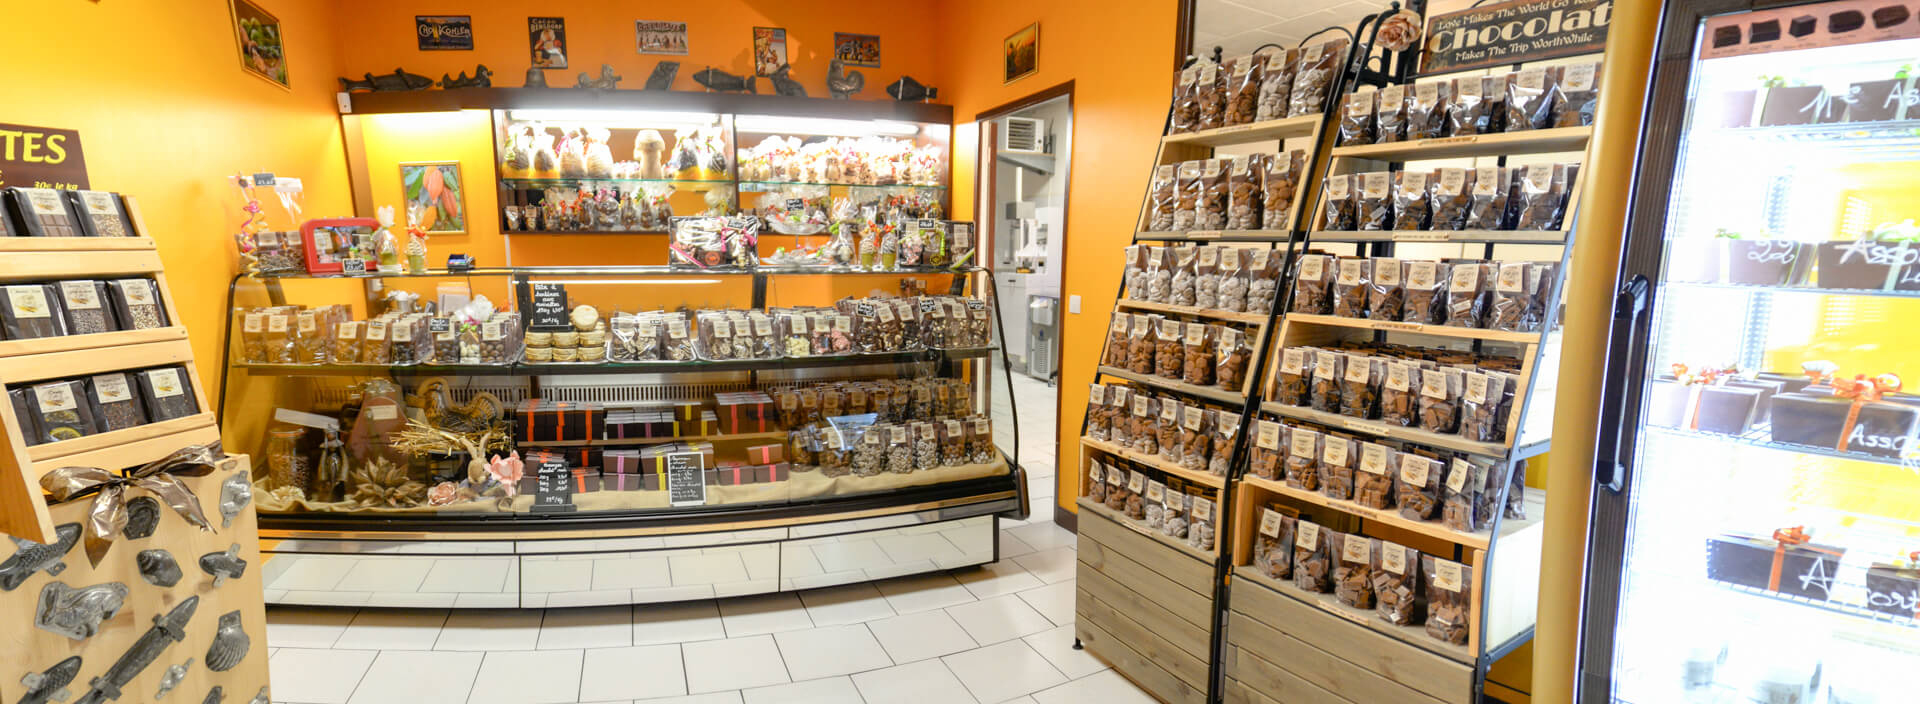 Chocolaterie Lafaye Chocolat, artisan chocolatier à Périgueux